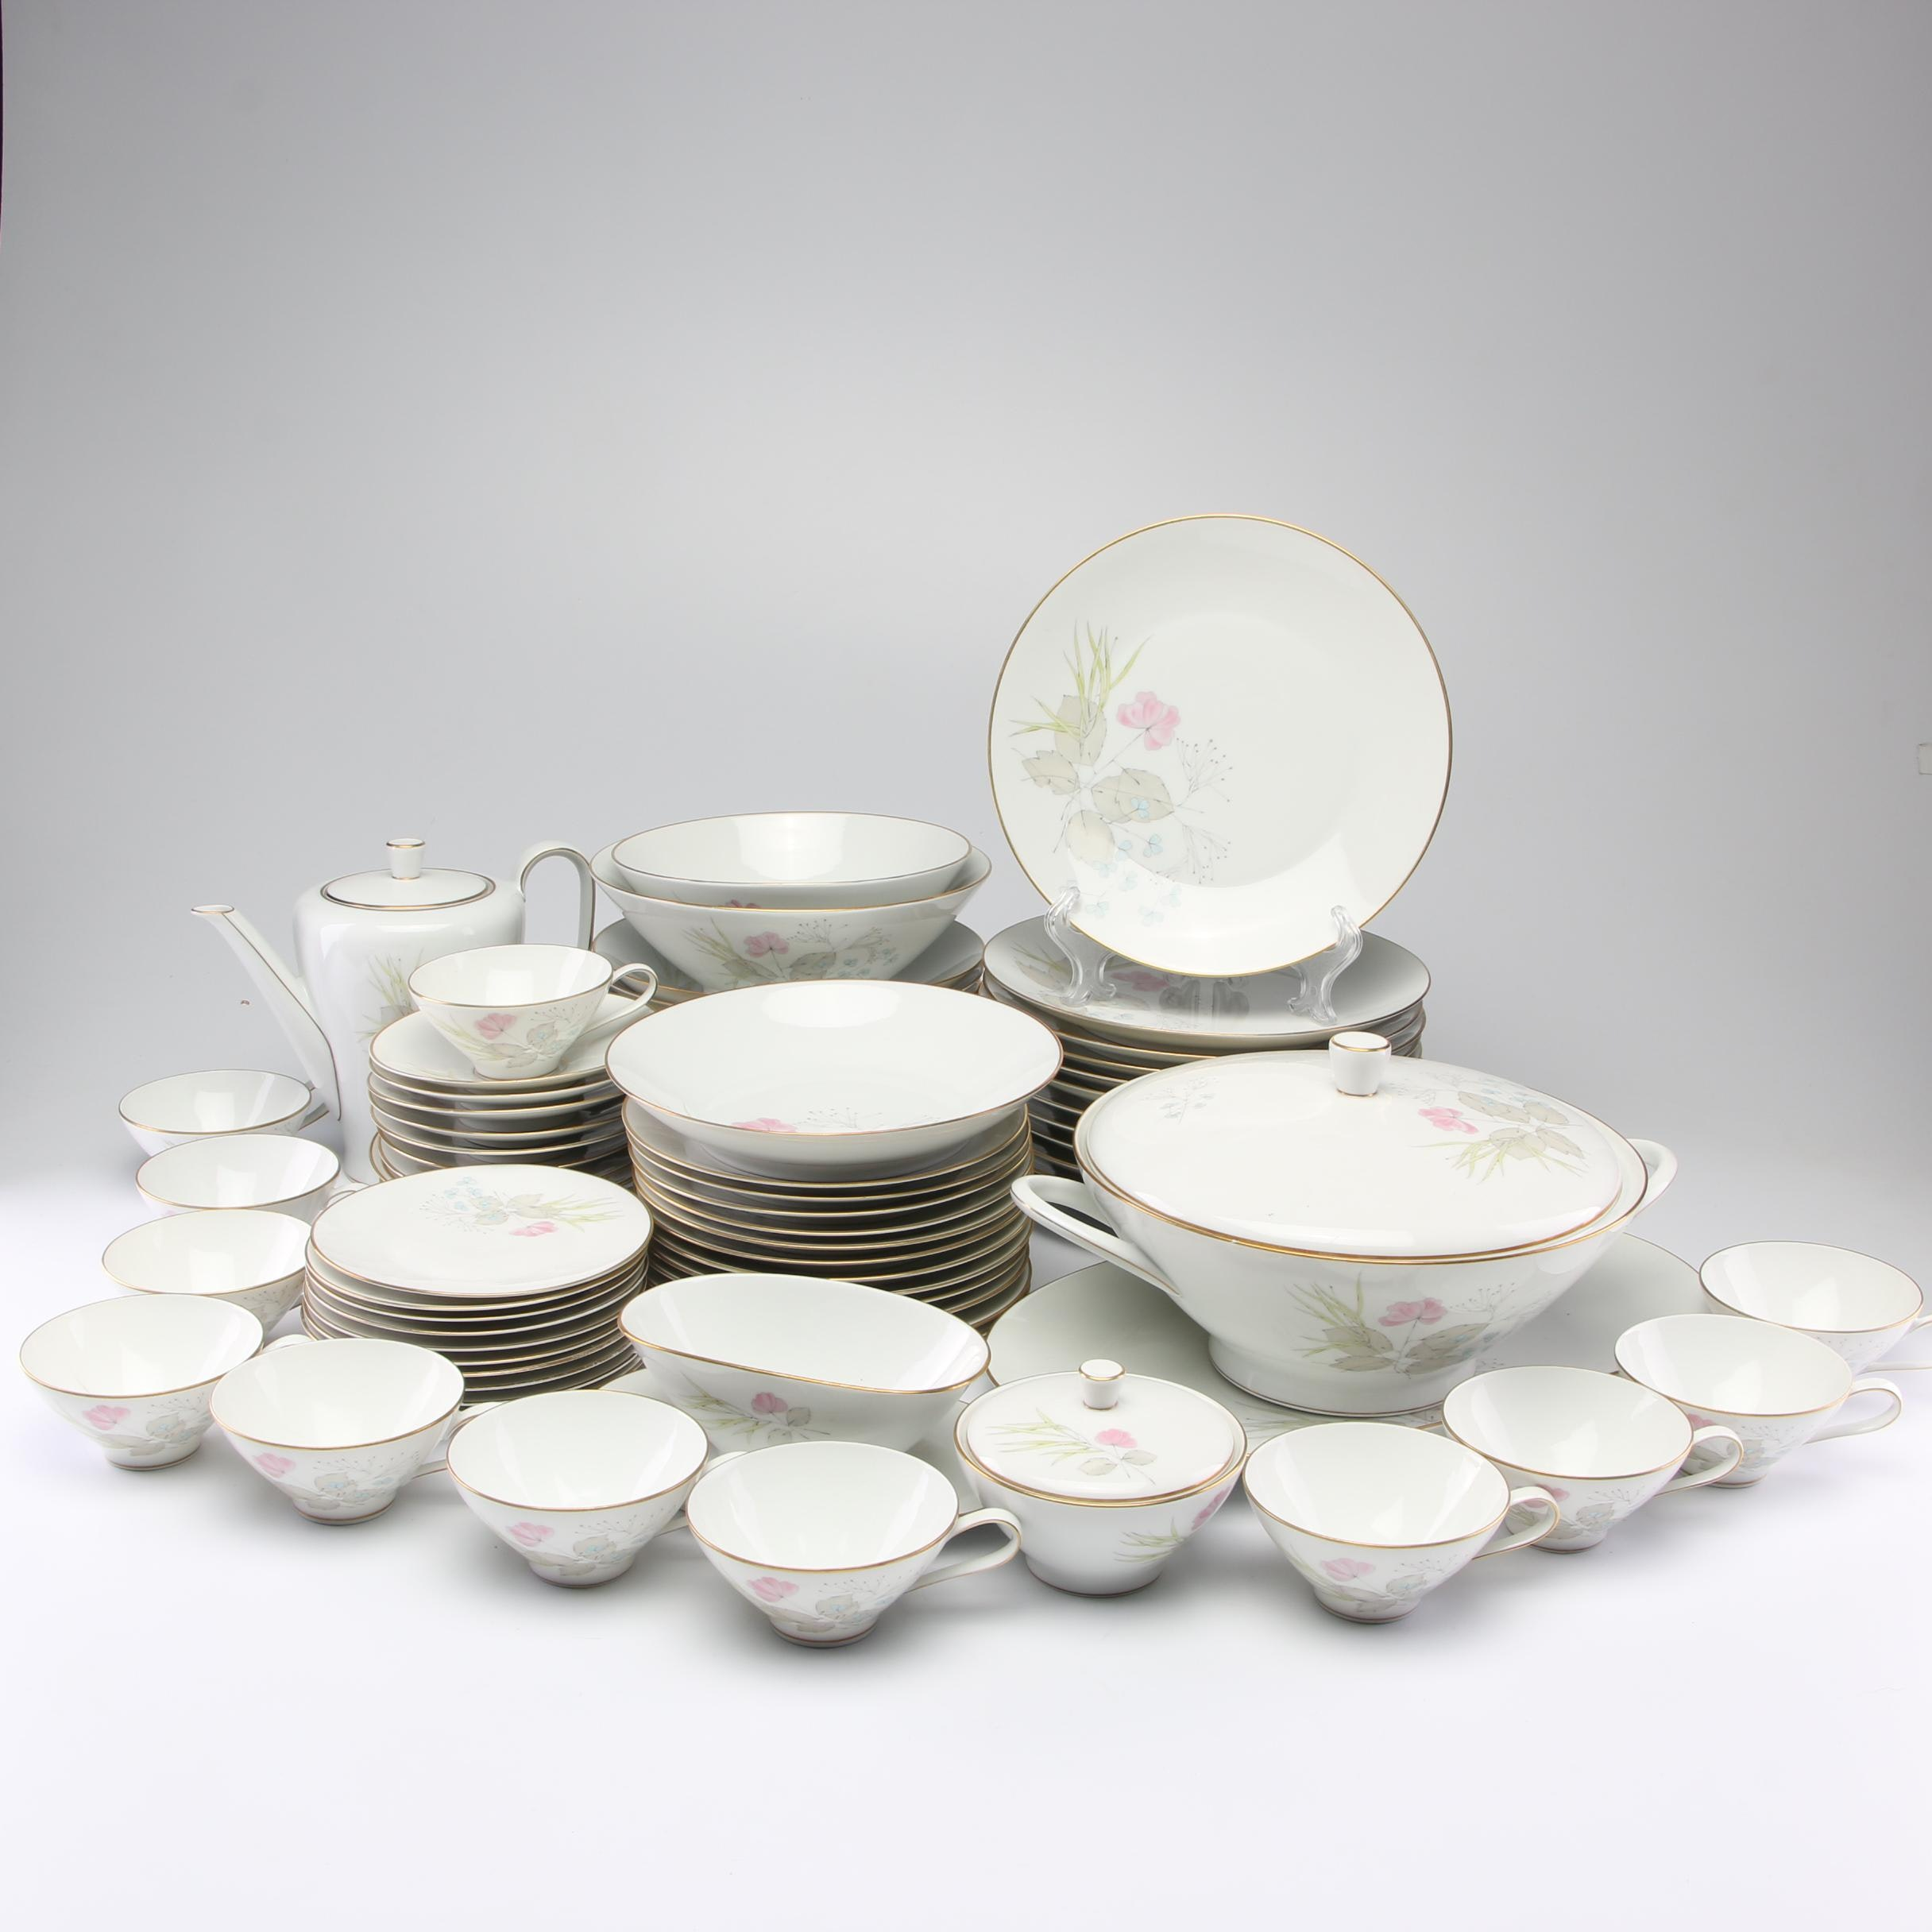 "Rosenthal Bettina ""Parisian Spring"" Porcelain Dinnerware, Circa 1950s"